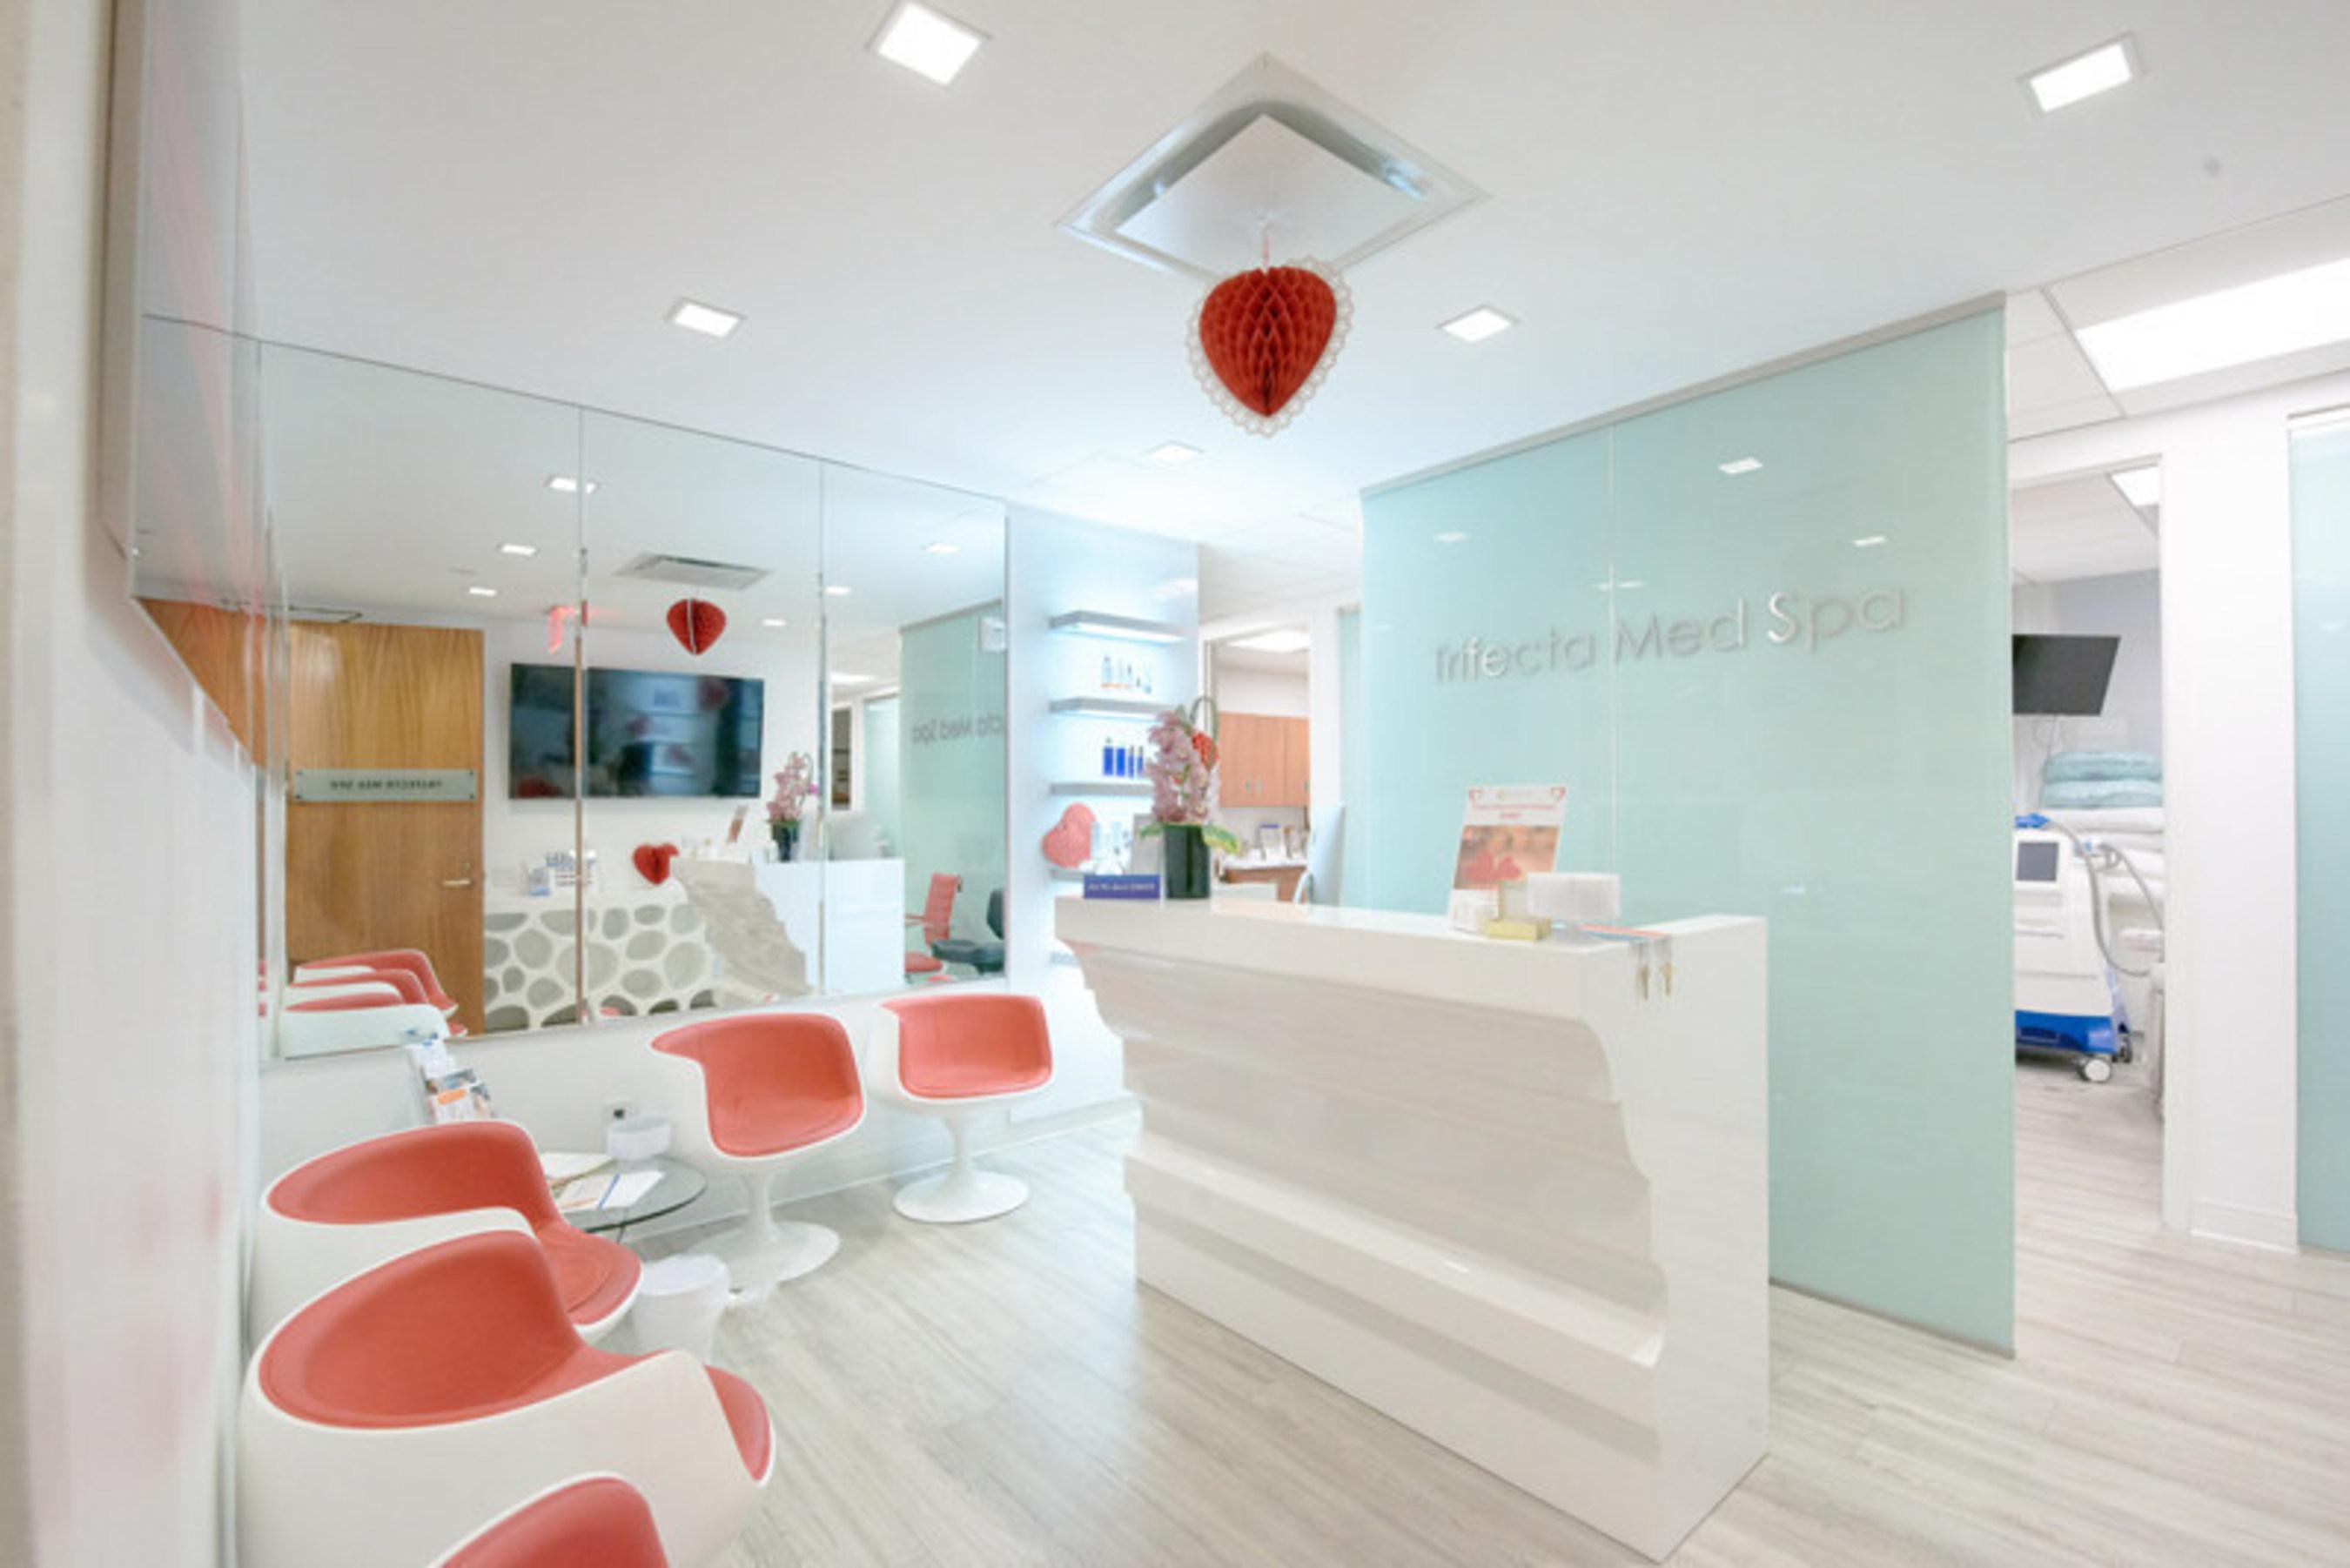 Beautiful Waiting Area at Trifecta Med SpaBeautiful Waiting Area at Trifecta Med Spa